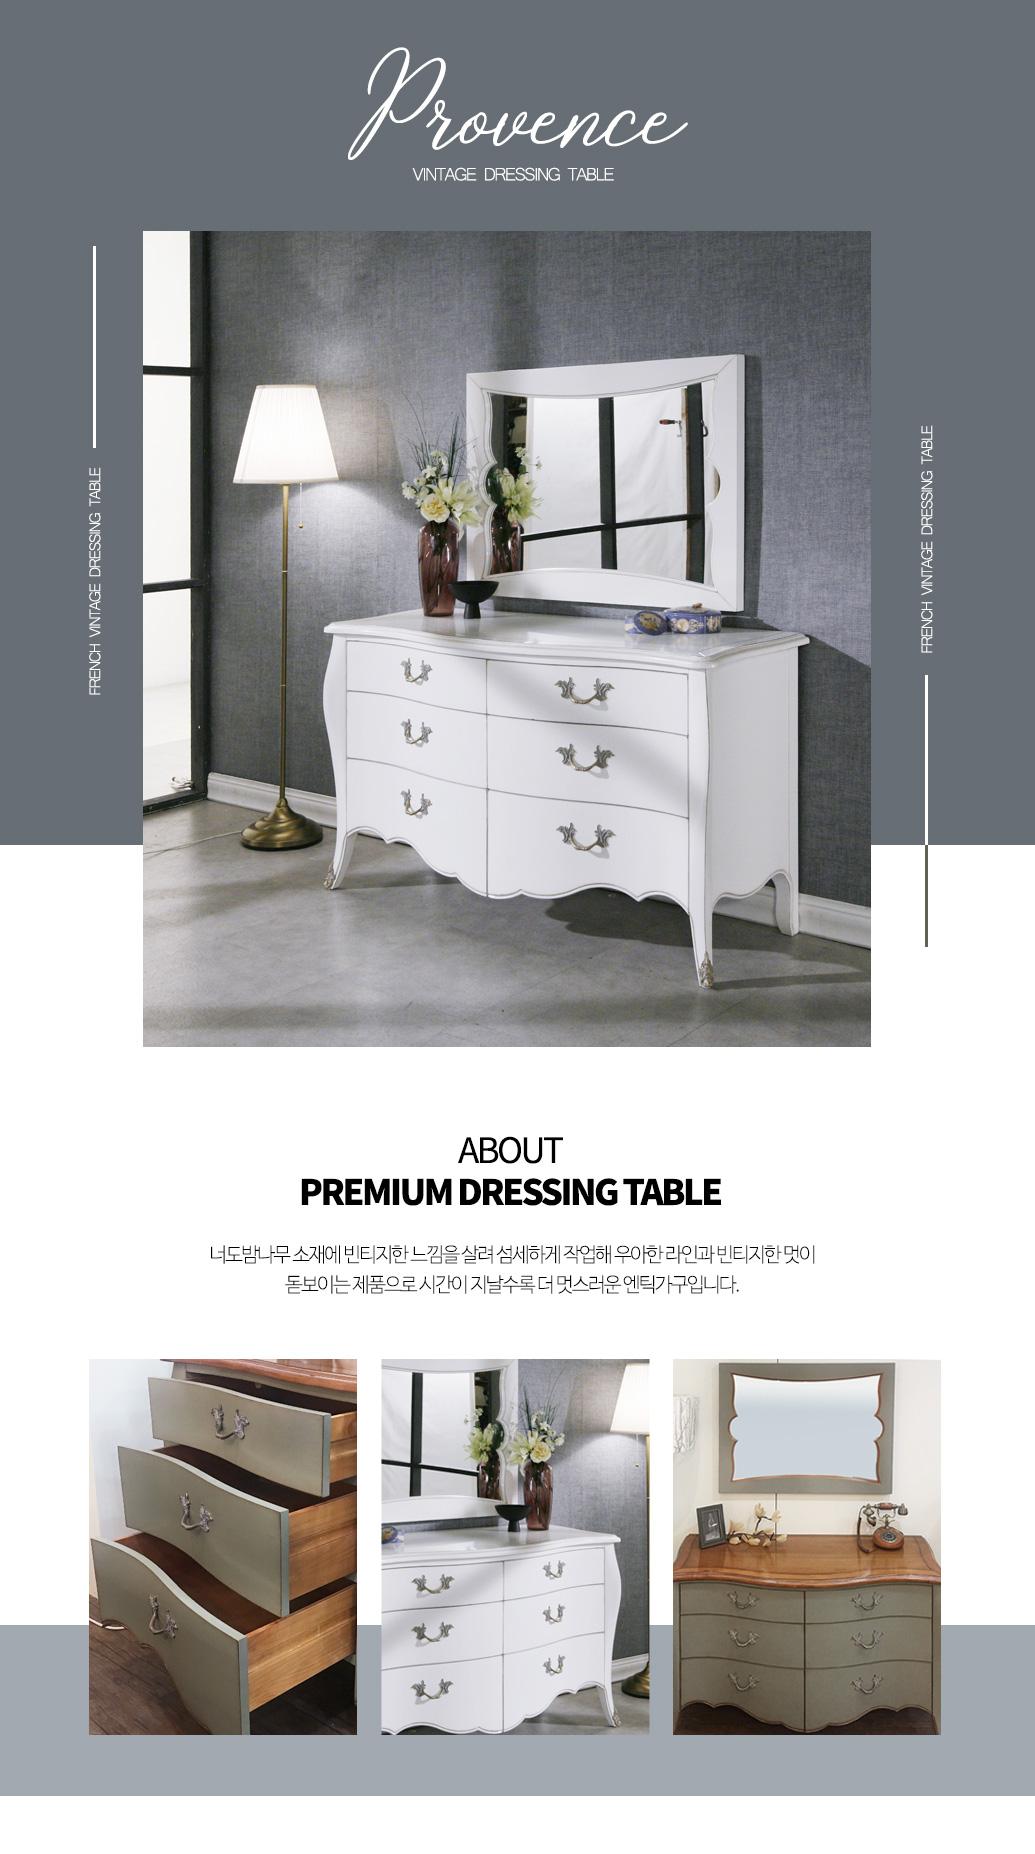 provence-dressing-table_01.jpg